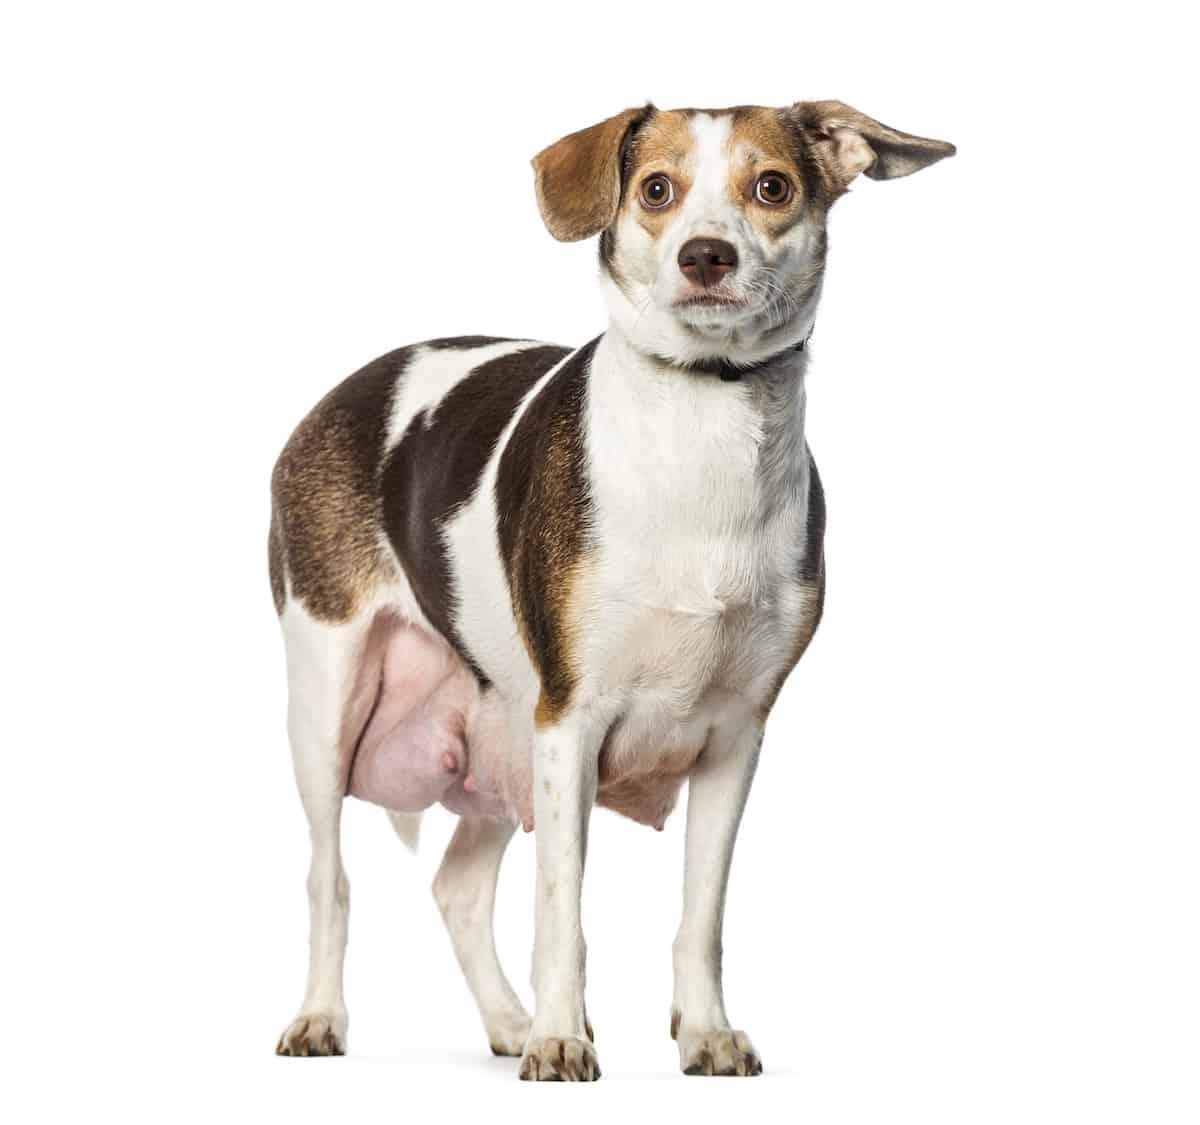 a pregnant dog